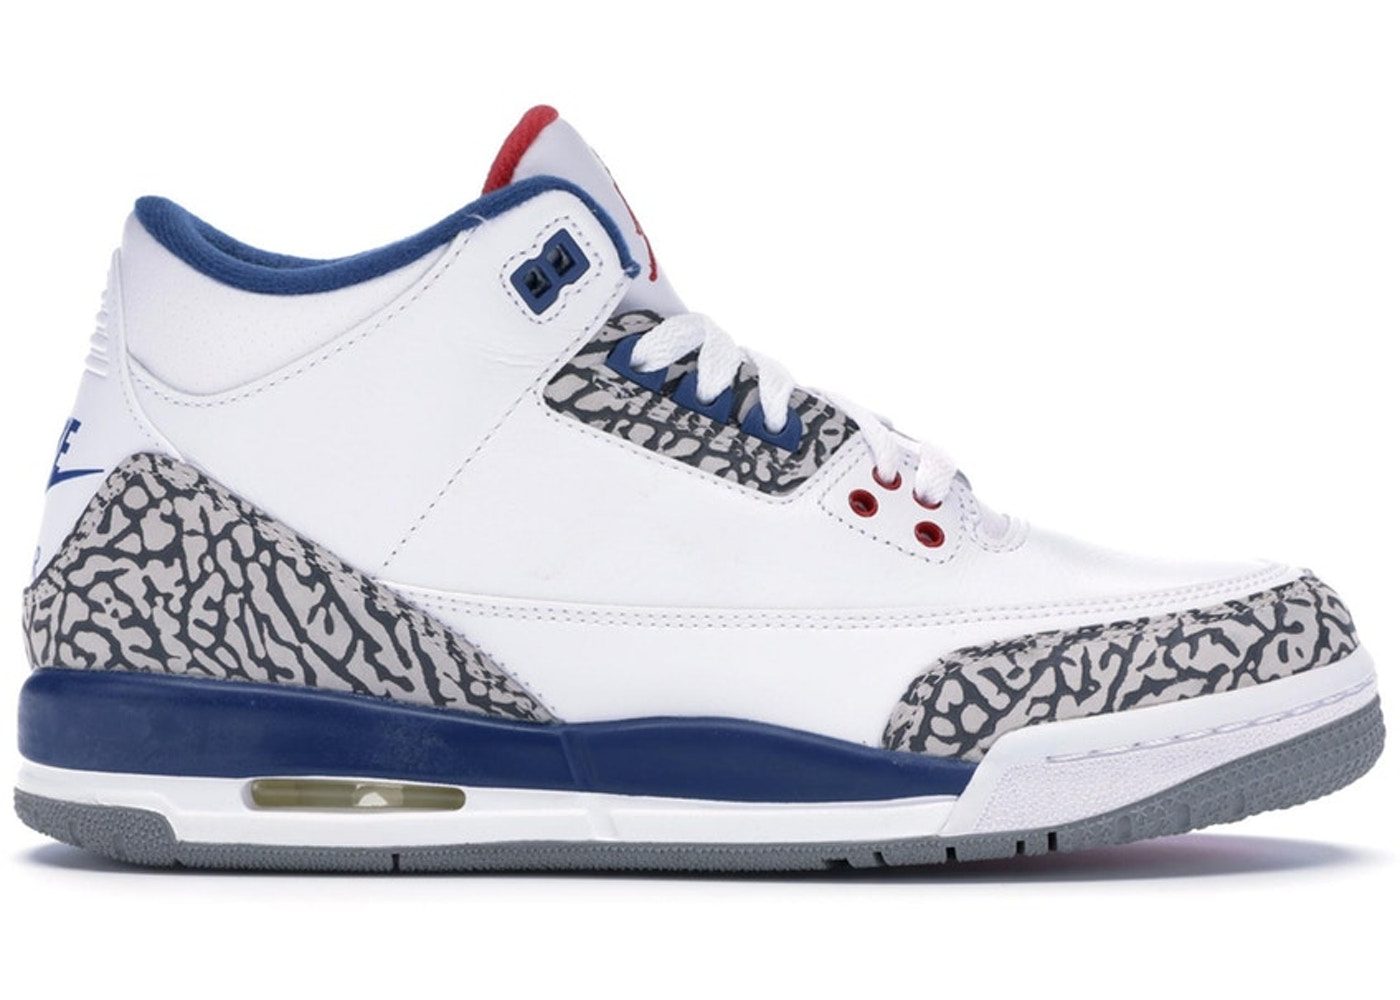 reputable site c39e7 8118a Buy Air Jordan 3 Shoes   Deadstock Sneakers